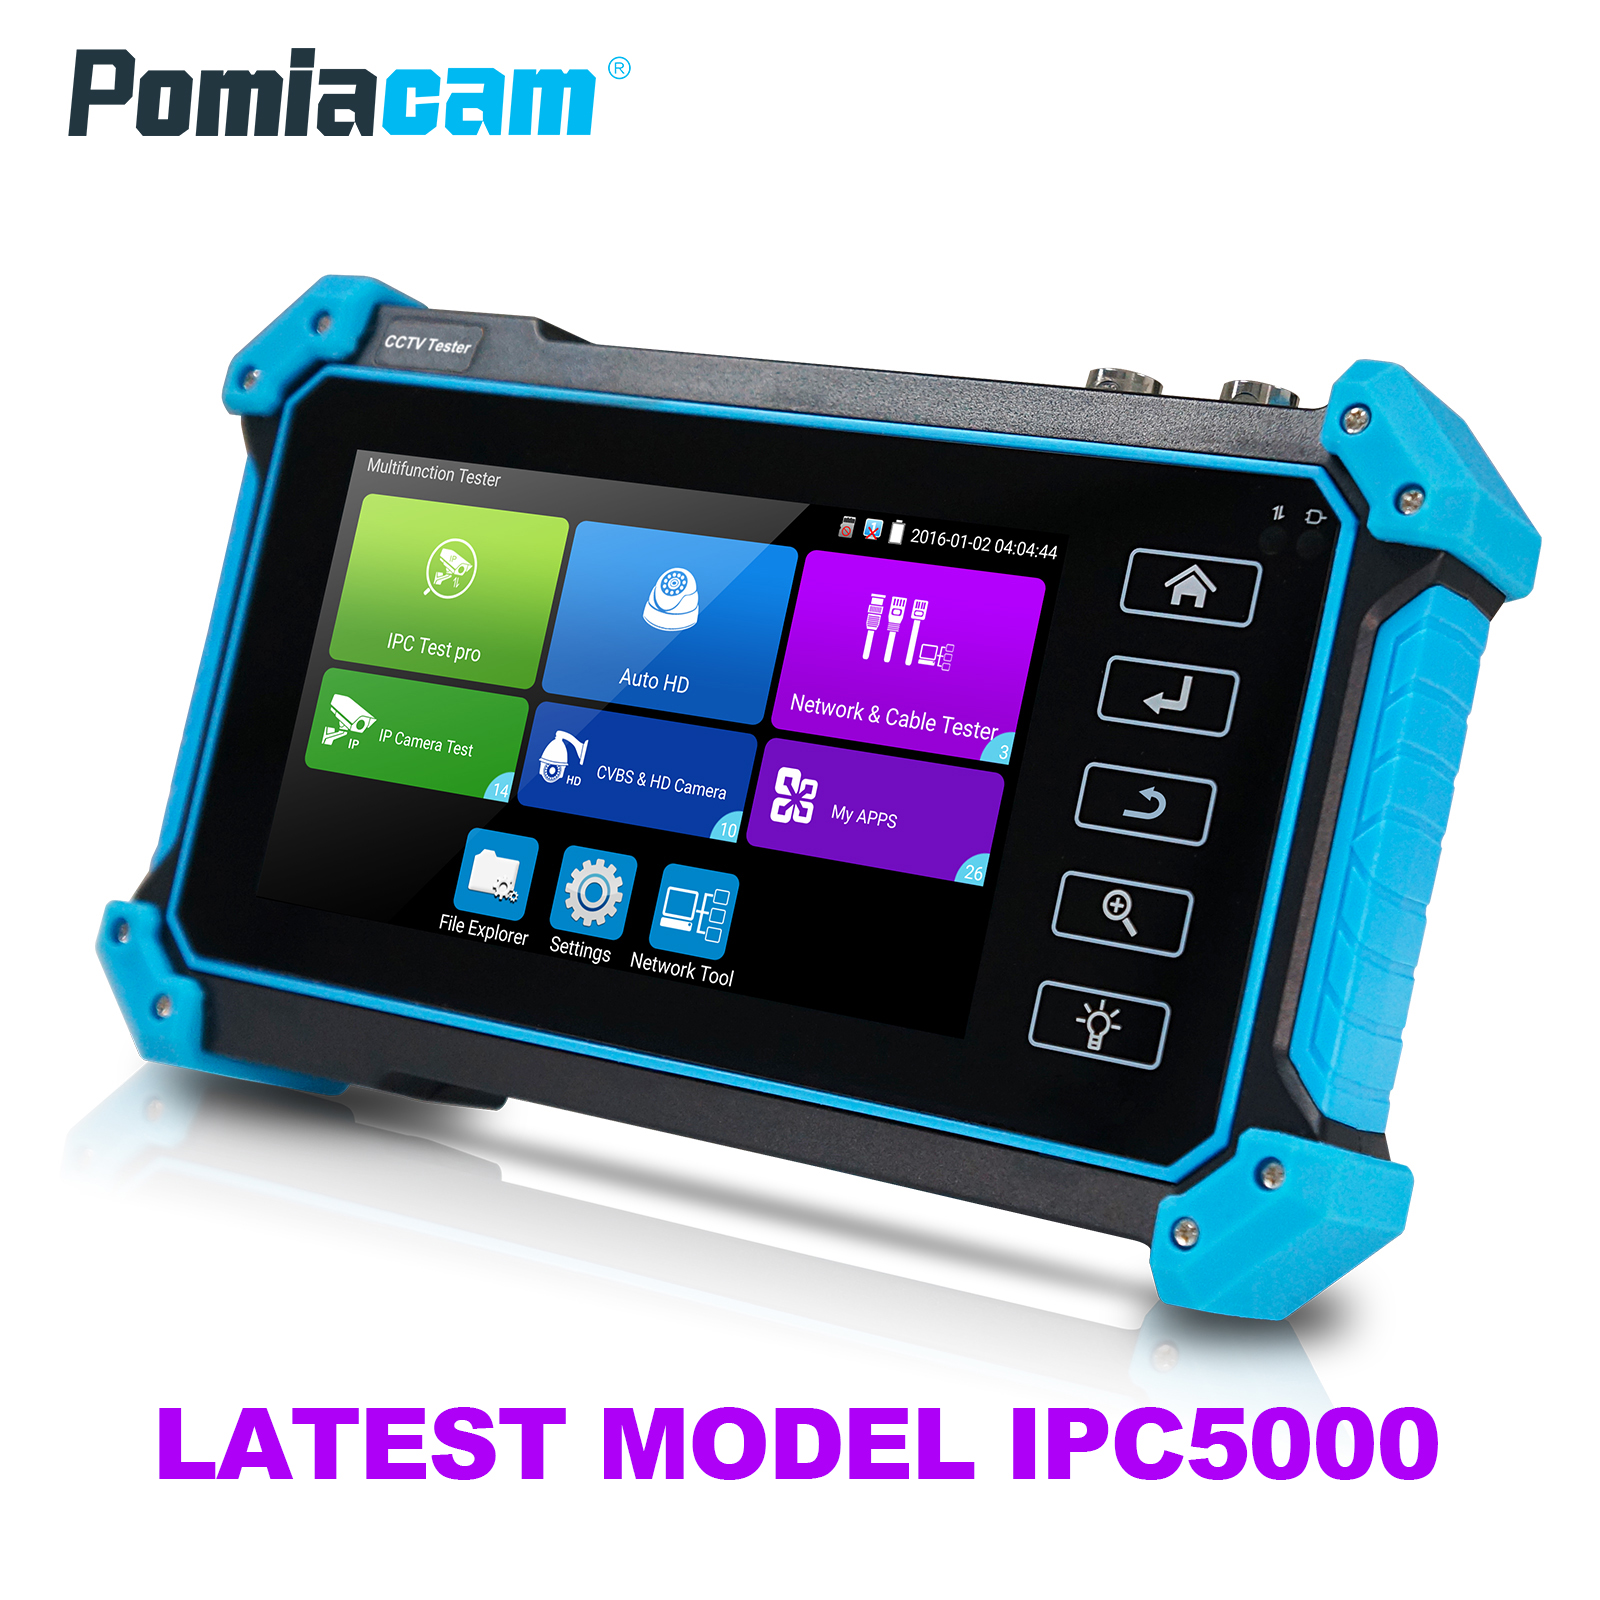 5 Inch Wanglu Coaxial HD CCTV Tester Monitor 8MP AHD TVI CVI IP IPC5000 Plus HDMI VGA Input Analog Test POE DC12V Output